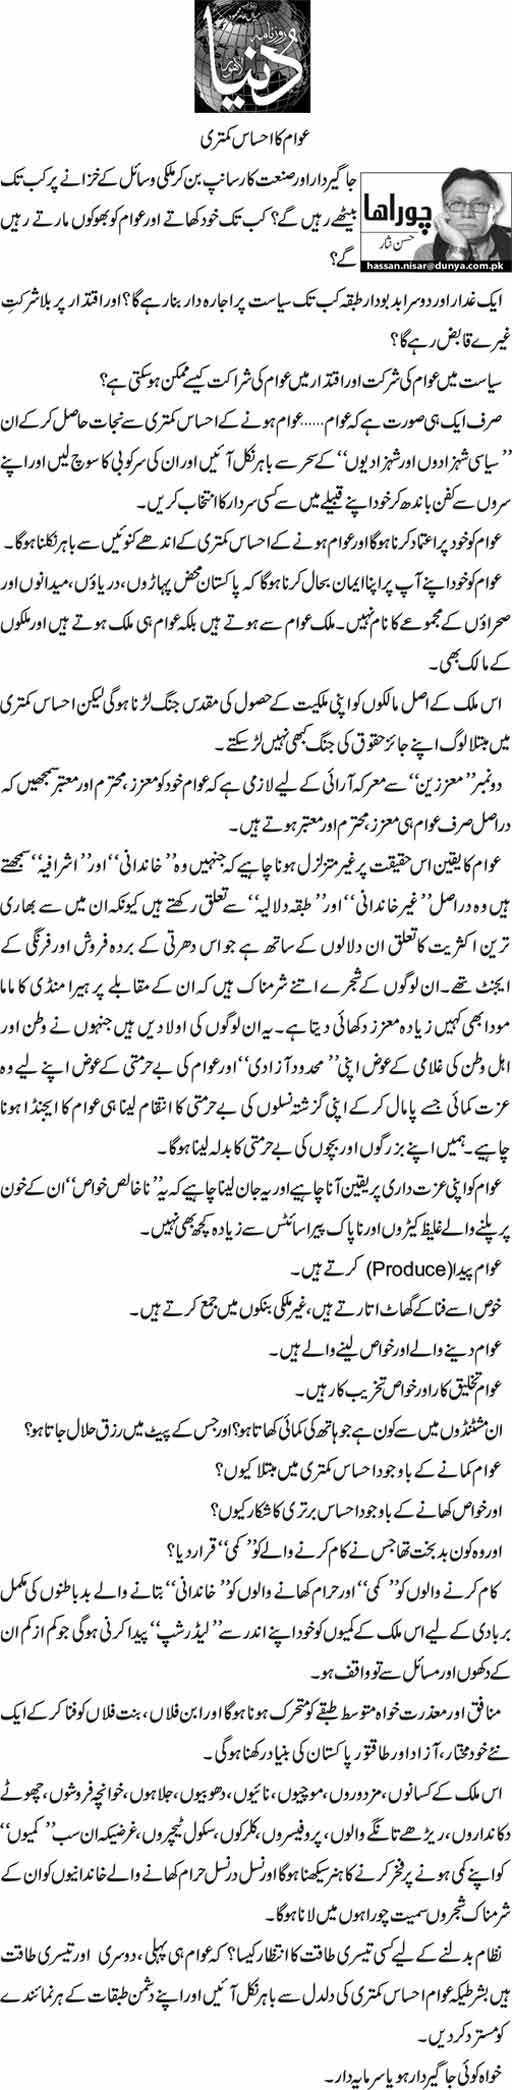 Awam Ka Aihsas e Kamtari - Hassan Nisar